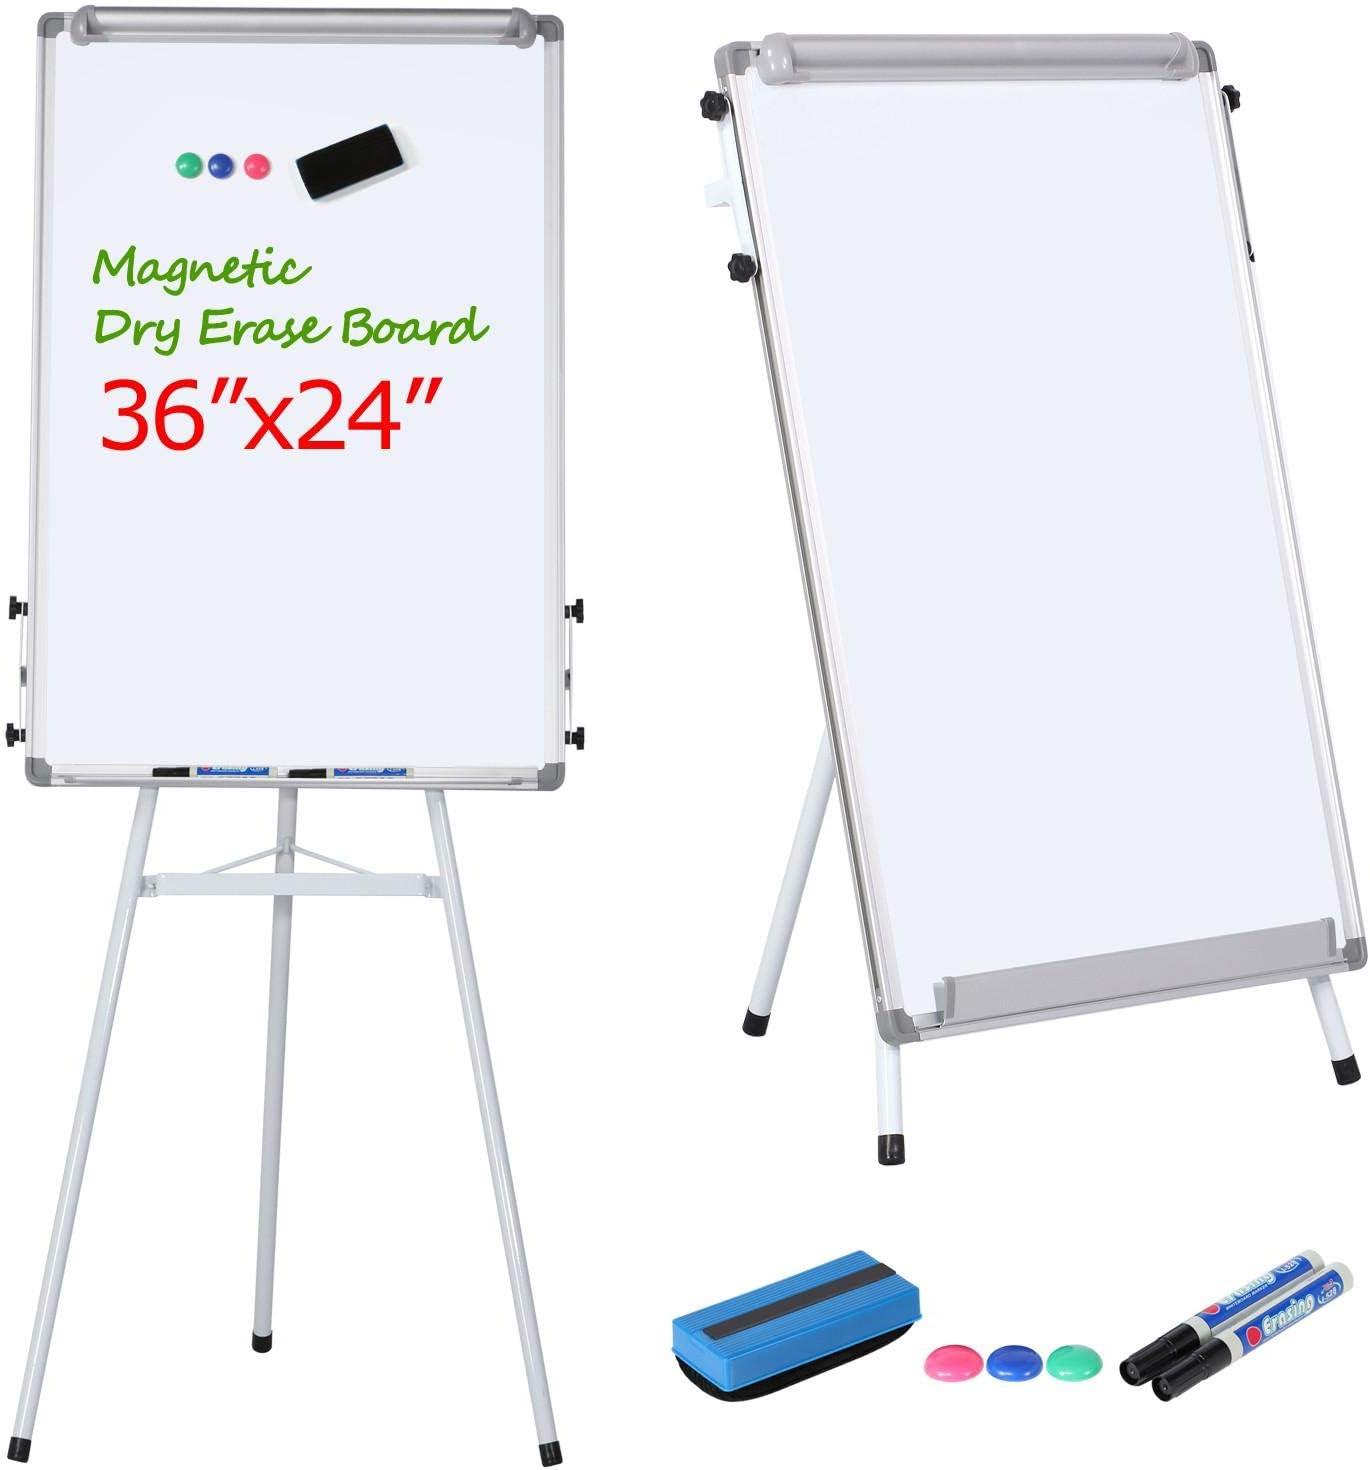 Yaheetech Portable Tripod Whiteboard Dry Erase Board Height Adjustable Magnetic White Board Flipchart Easel